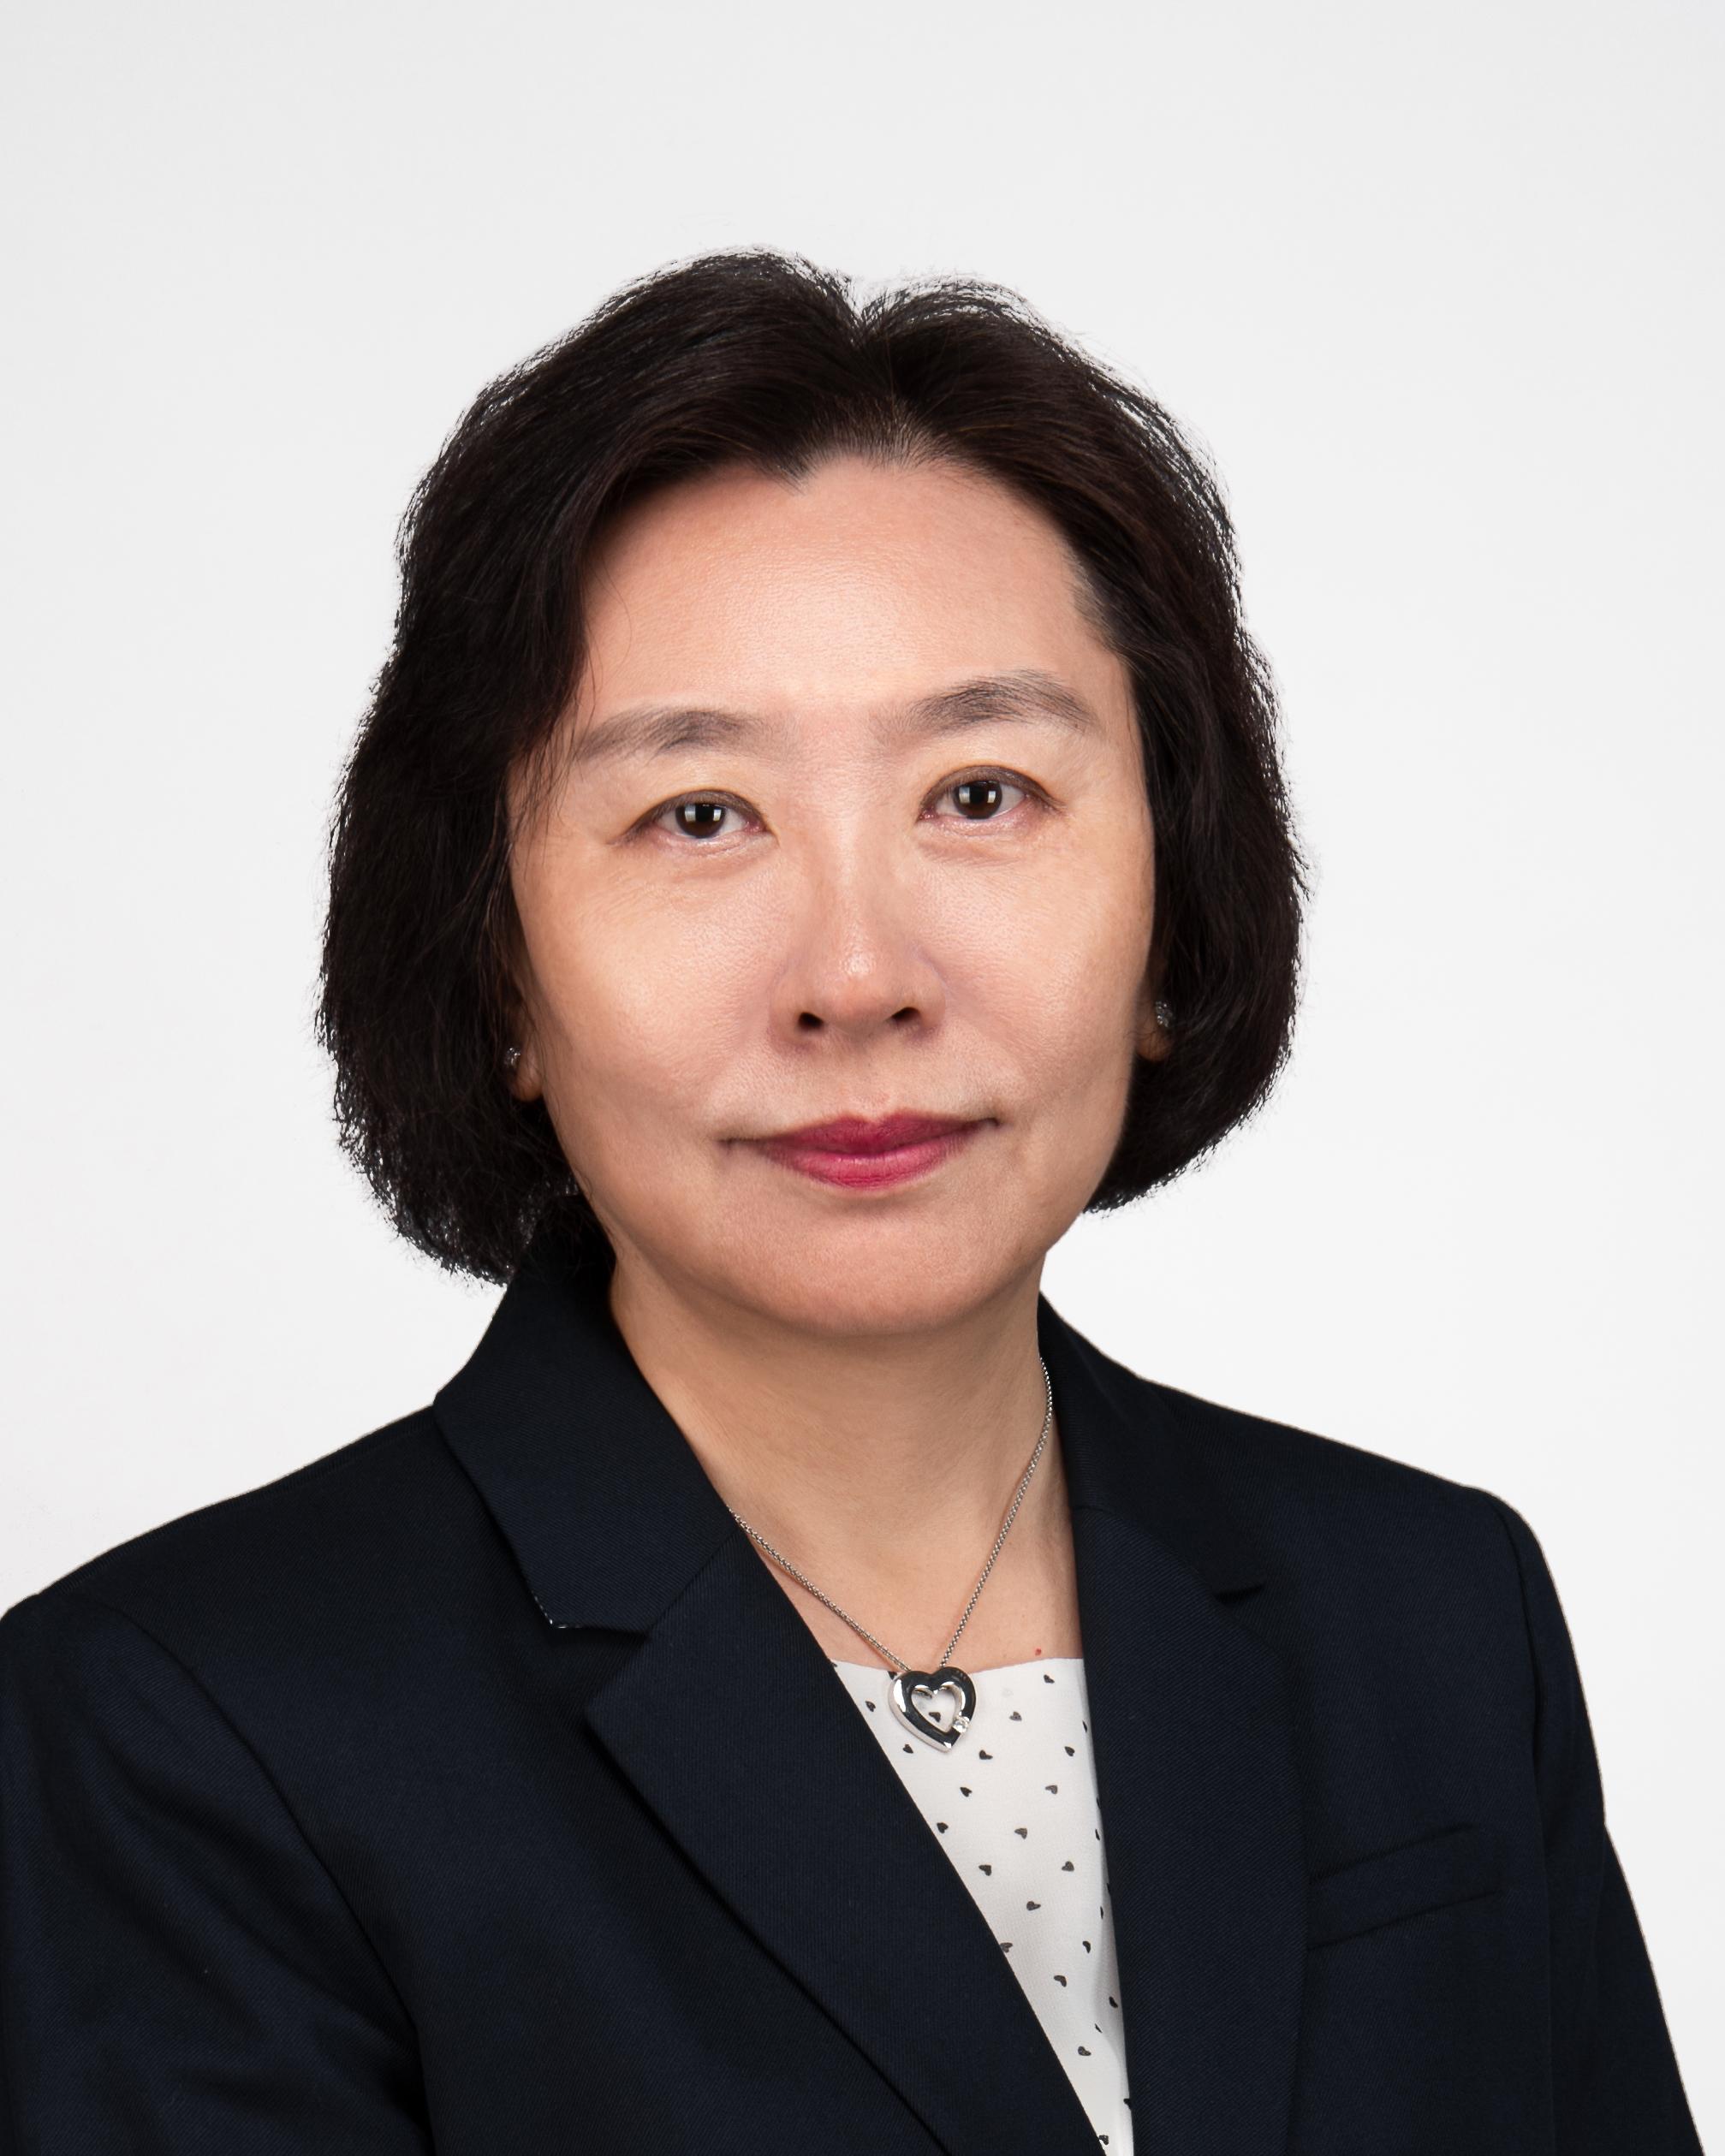 Prof. Kathy Qian LUO